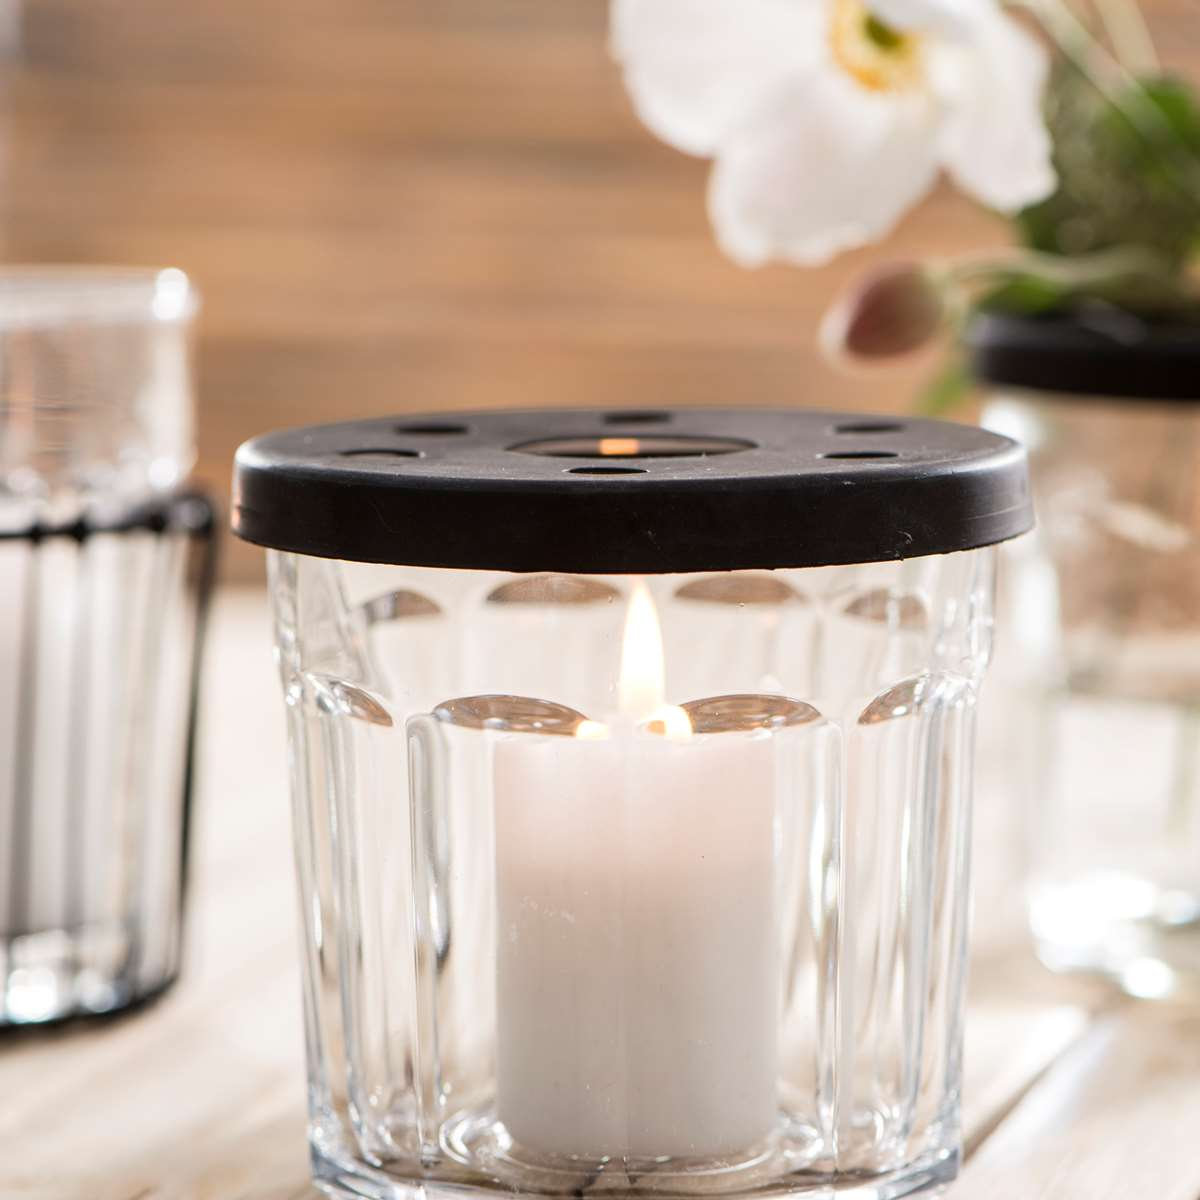 deckel mit l chern f r marmeladen glas. Black Bedroom Furniture Sets. Home Design Ideas